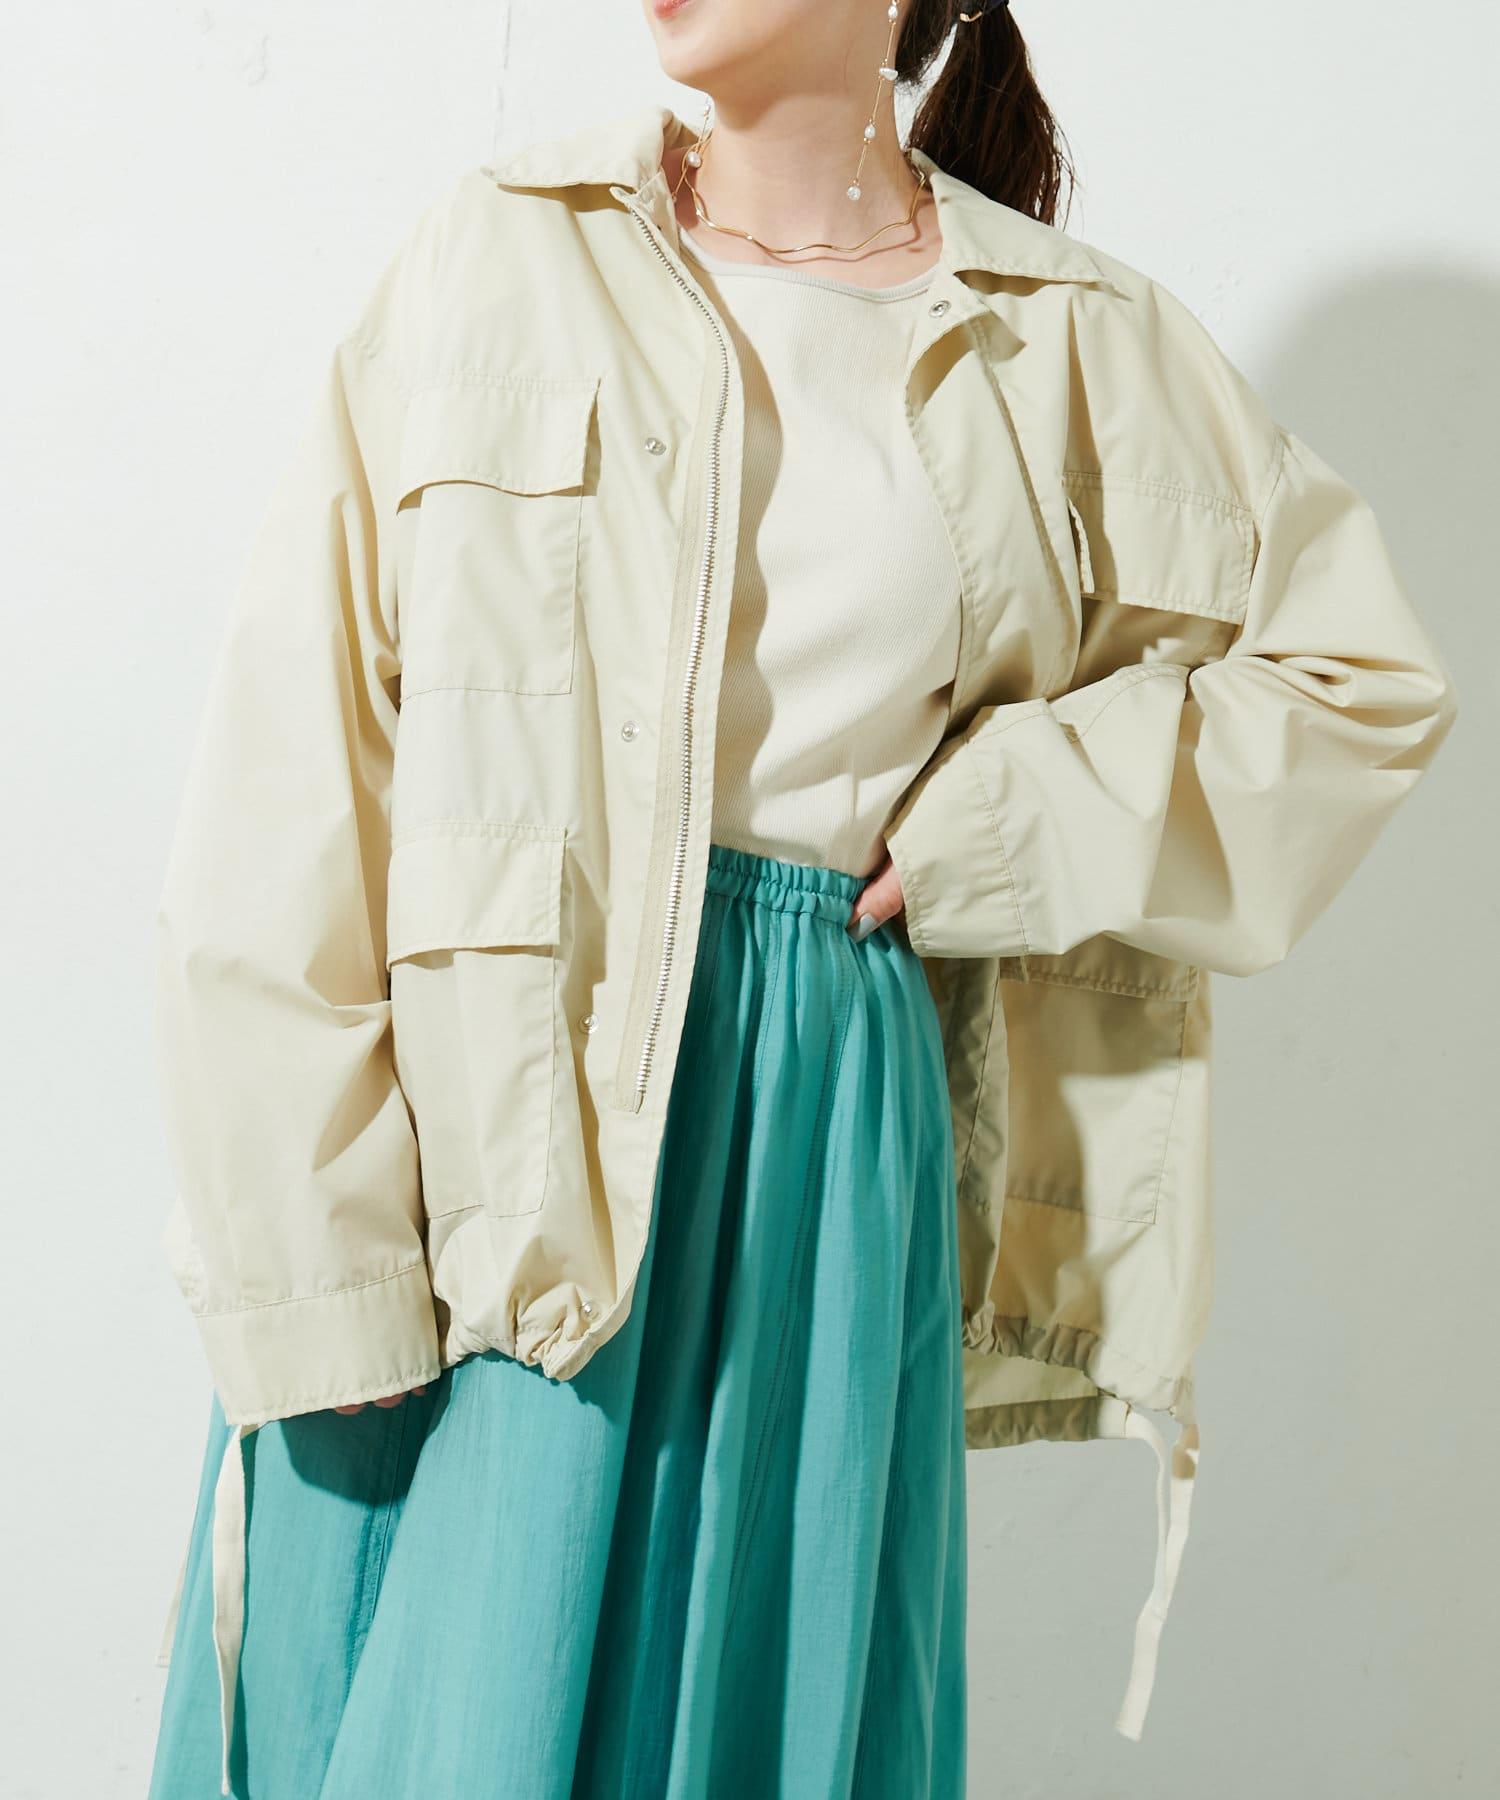 OUTLET(アウトレット) レディース 【Discoat】オソロミリタリーシャツジャケット エクリュ